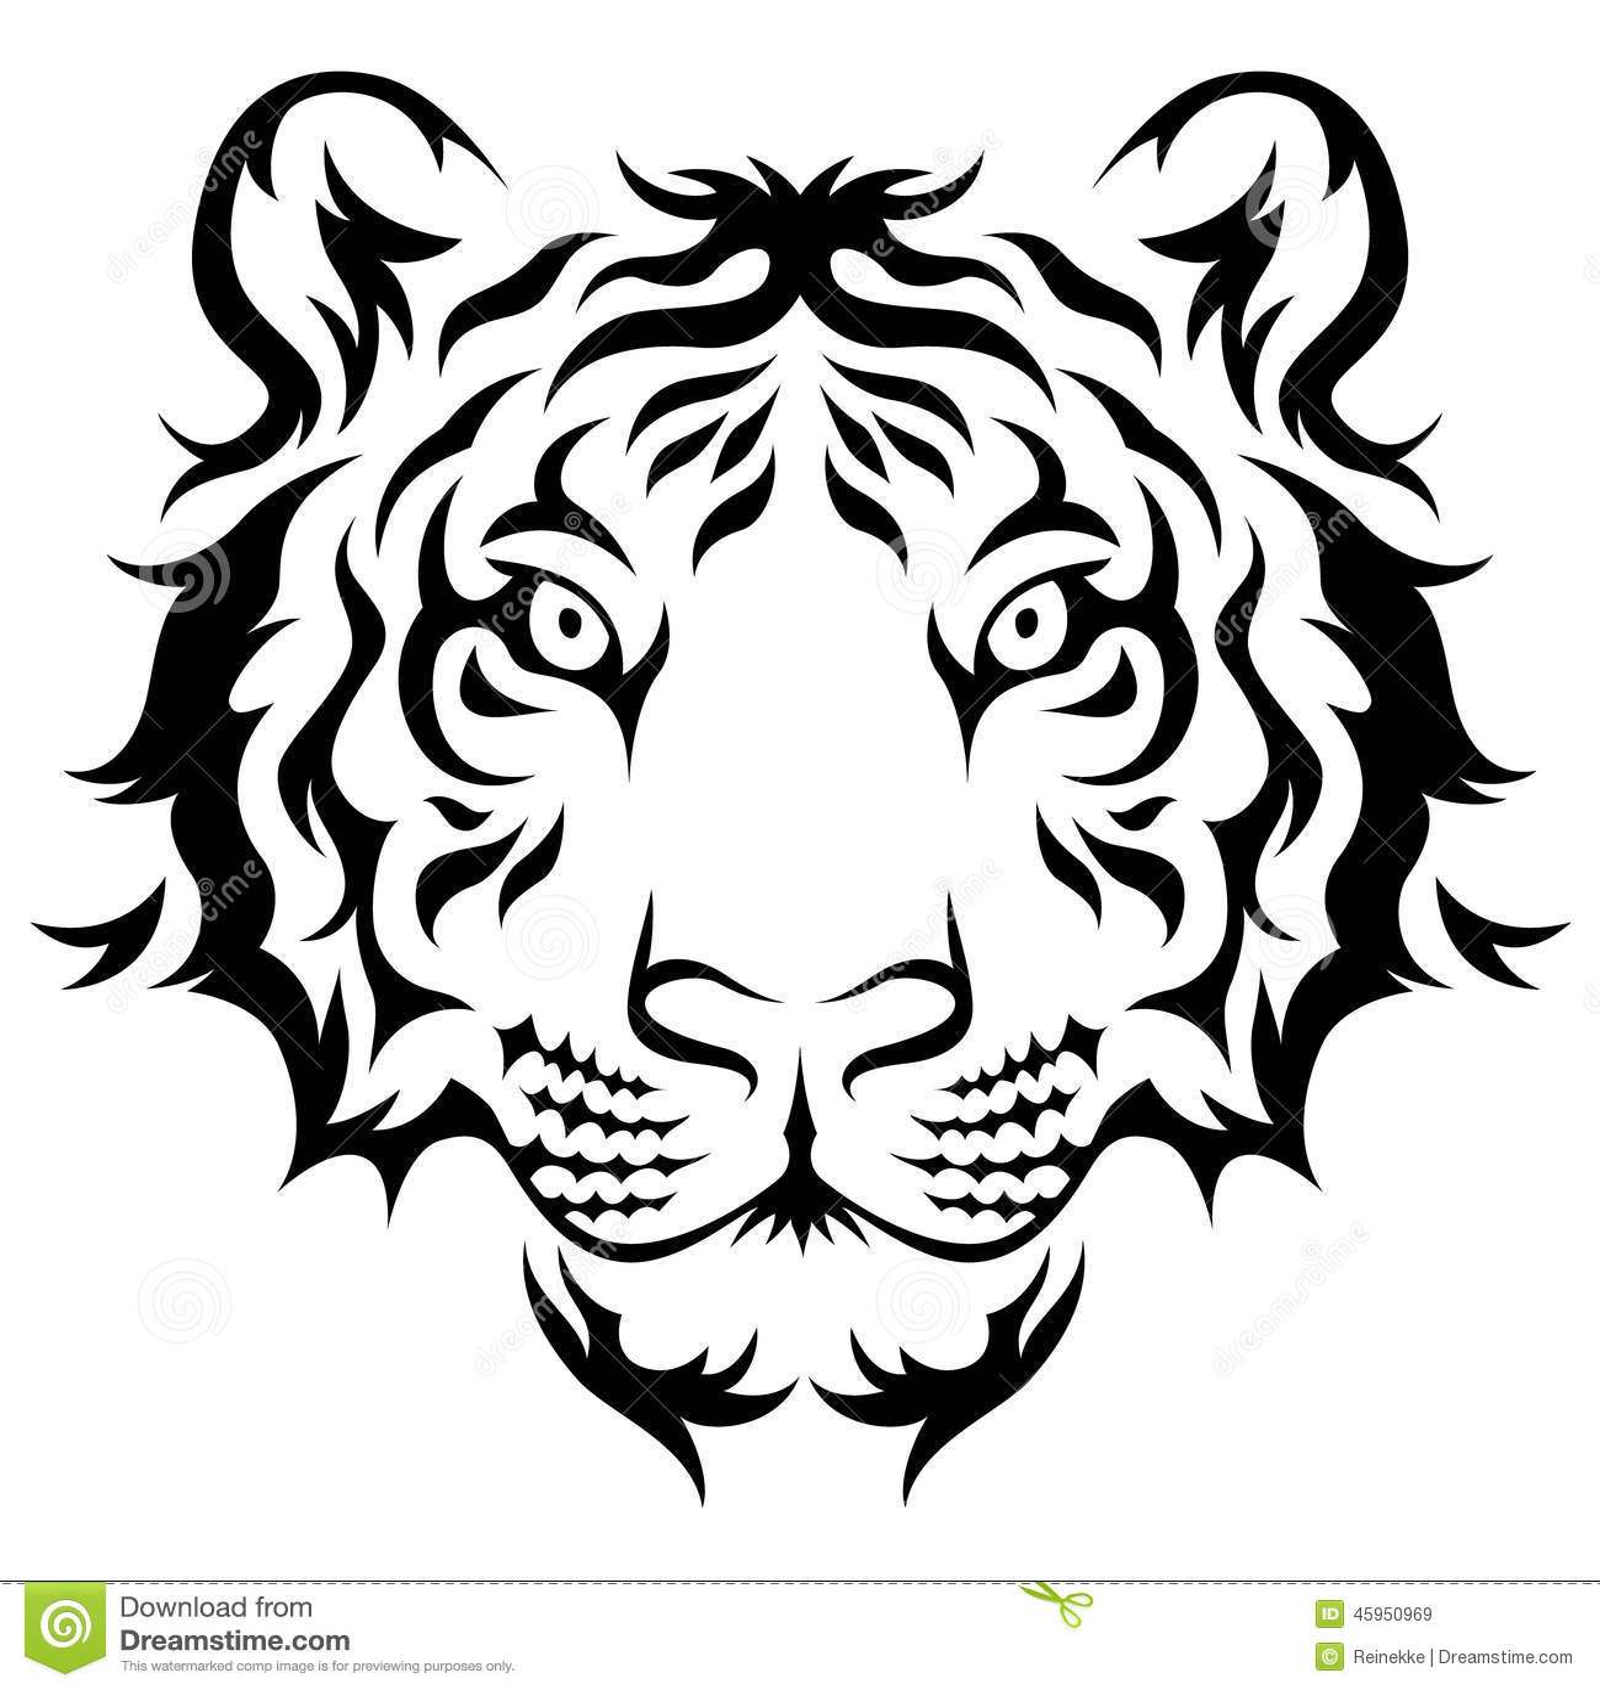 44832d2dc Tribal tiger stock vector. Illustration of white, striped - 45950969